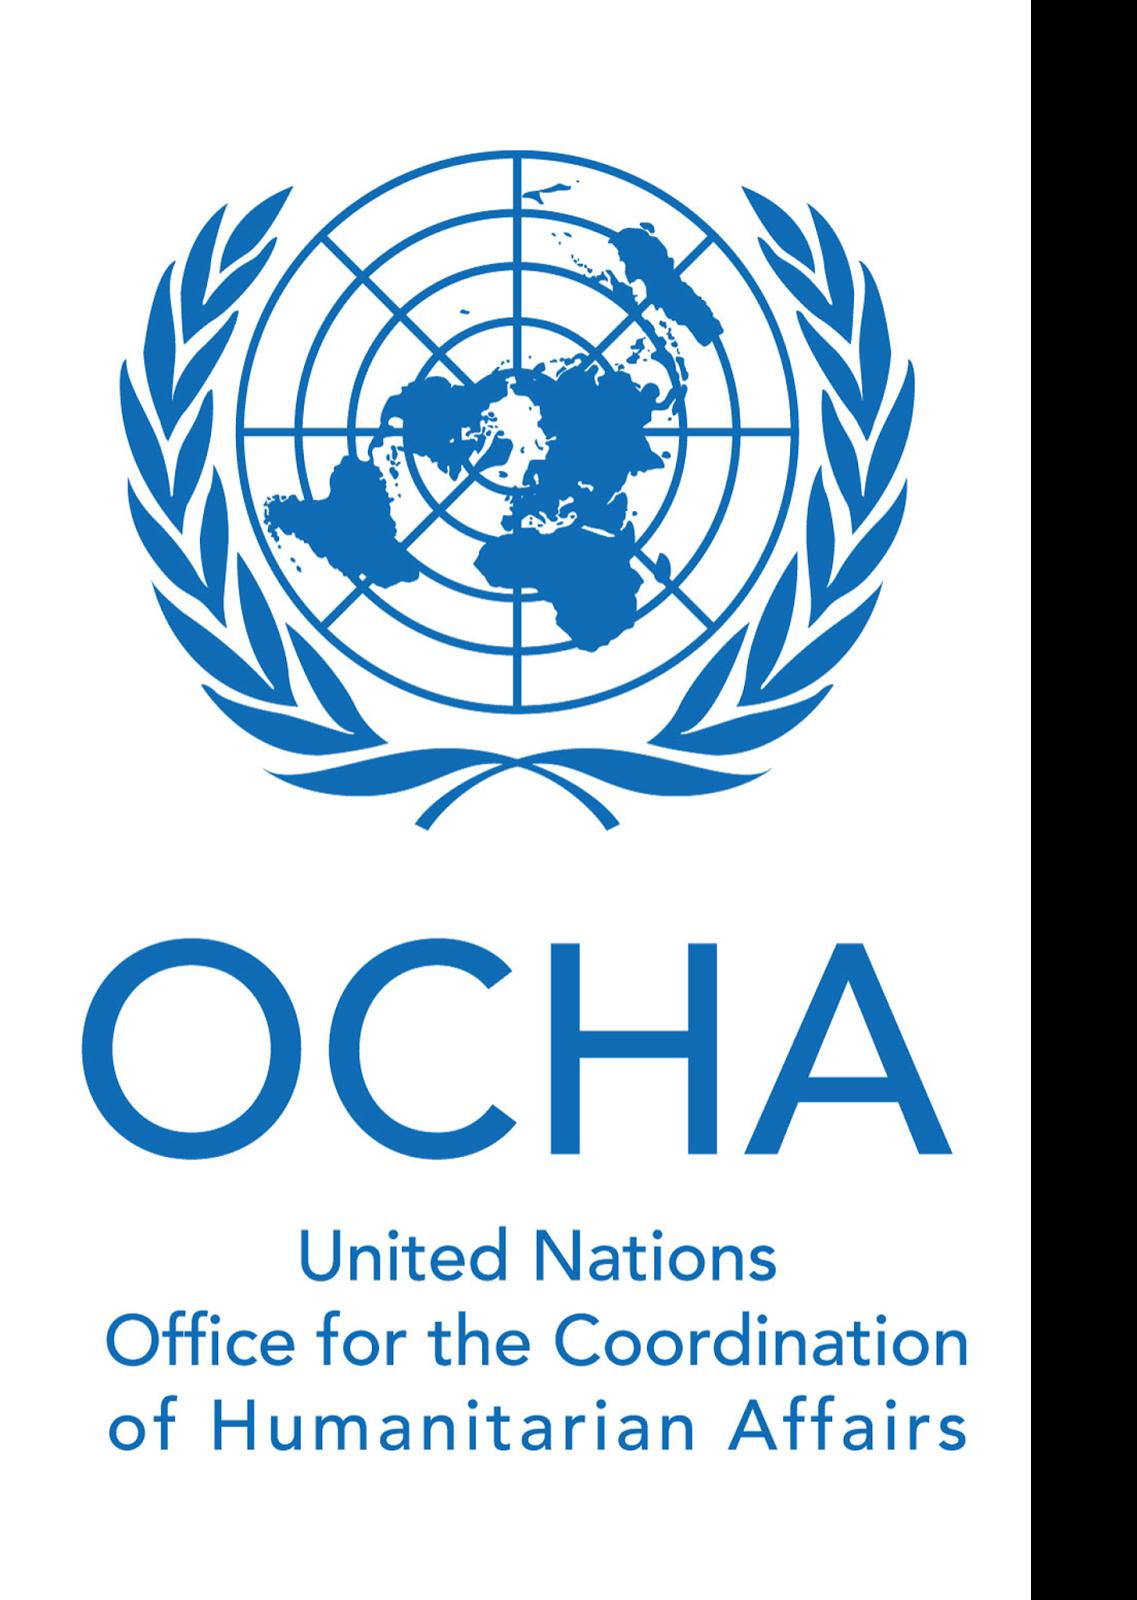 un-ocha-logo Job Application Form In Lebanon on blank generic, free generic, part time,